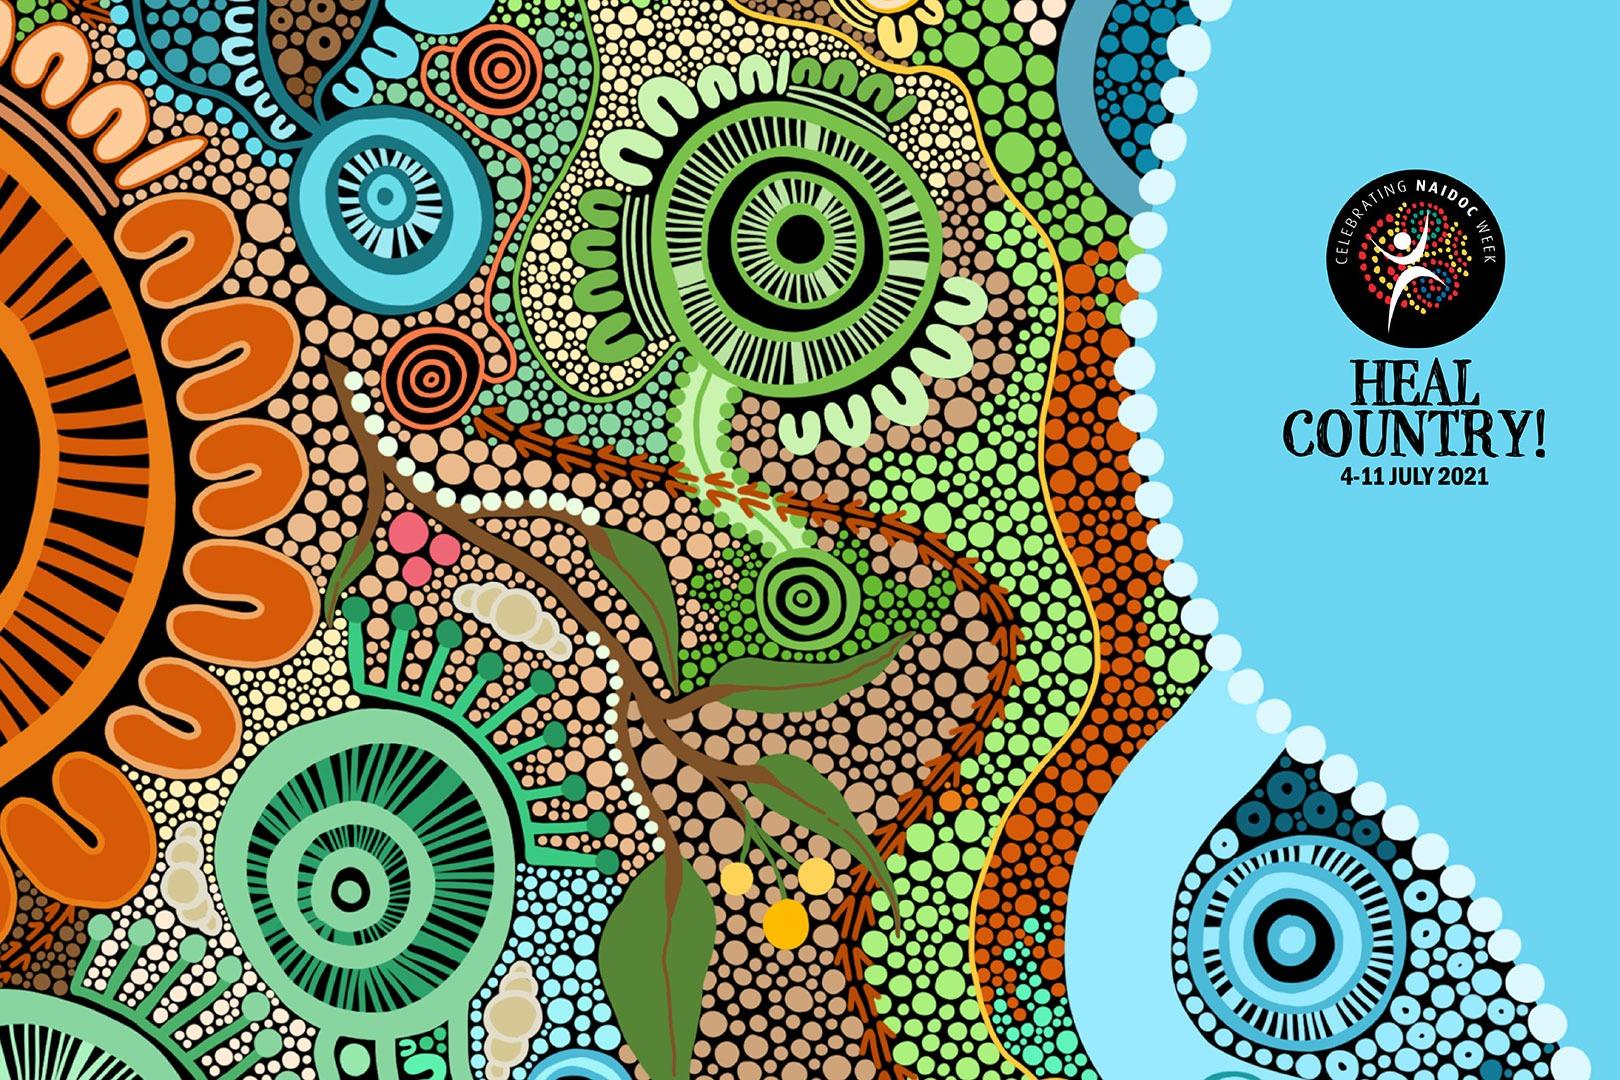 Article image: NAIDOC 2021 Heal Country